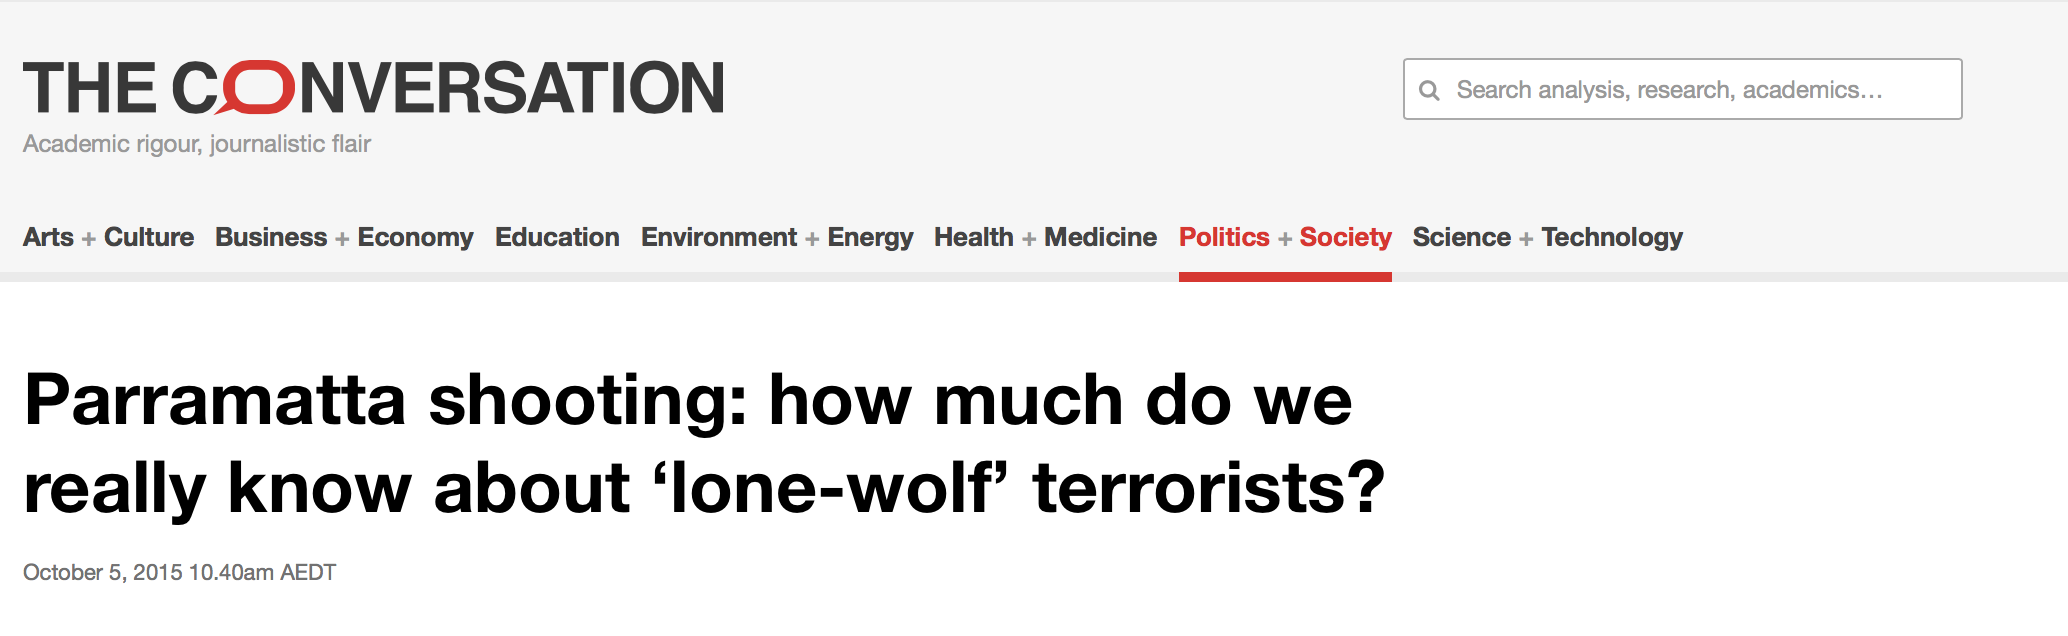 Farhad Jabar was not a lone wolf murderer - academic with